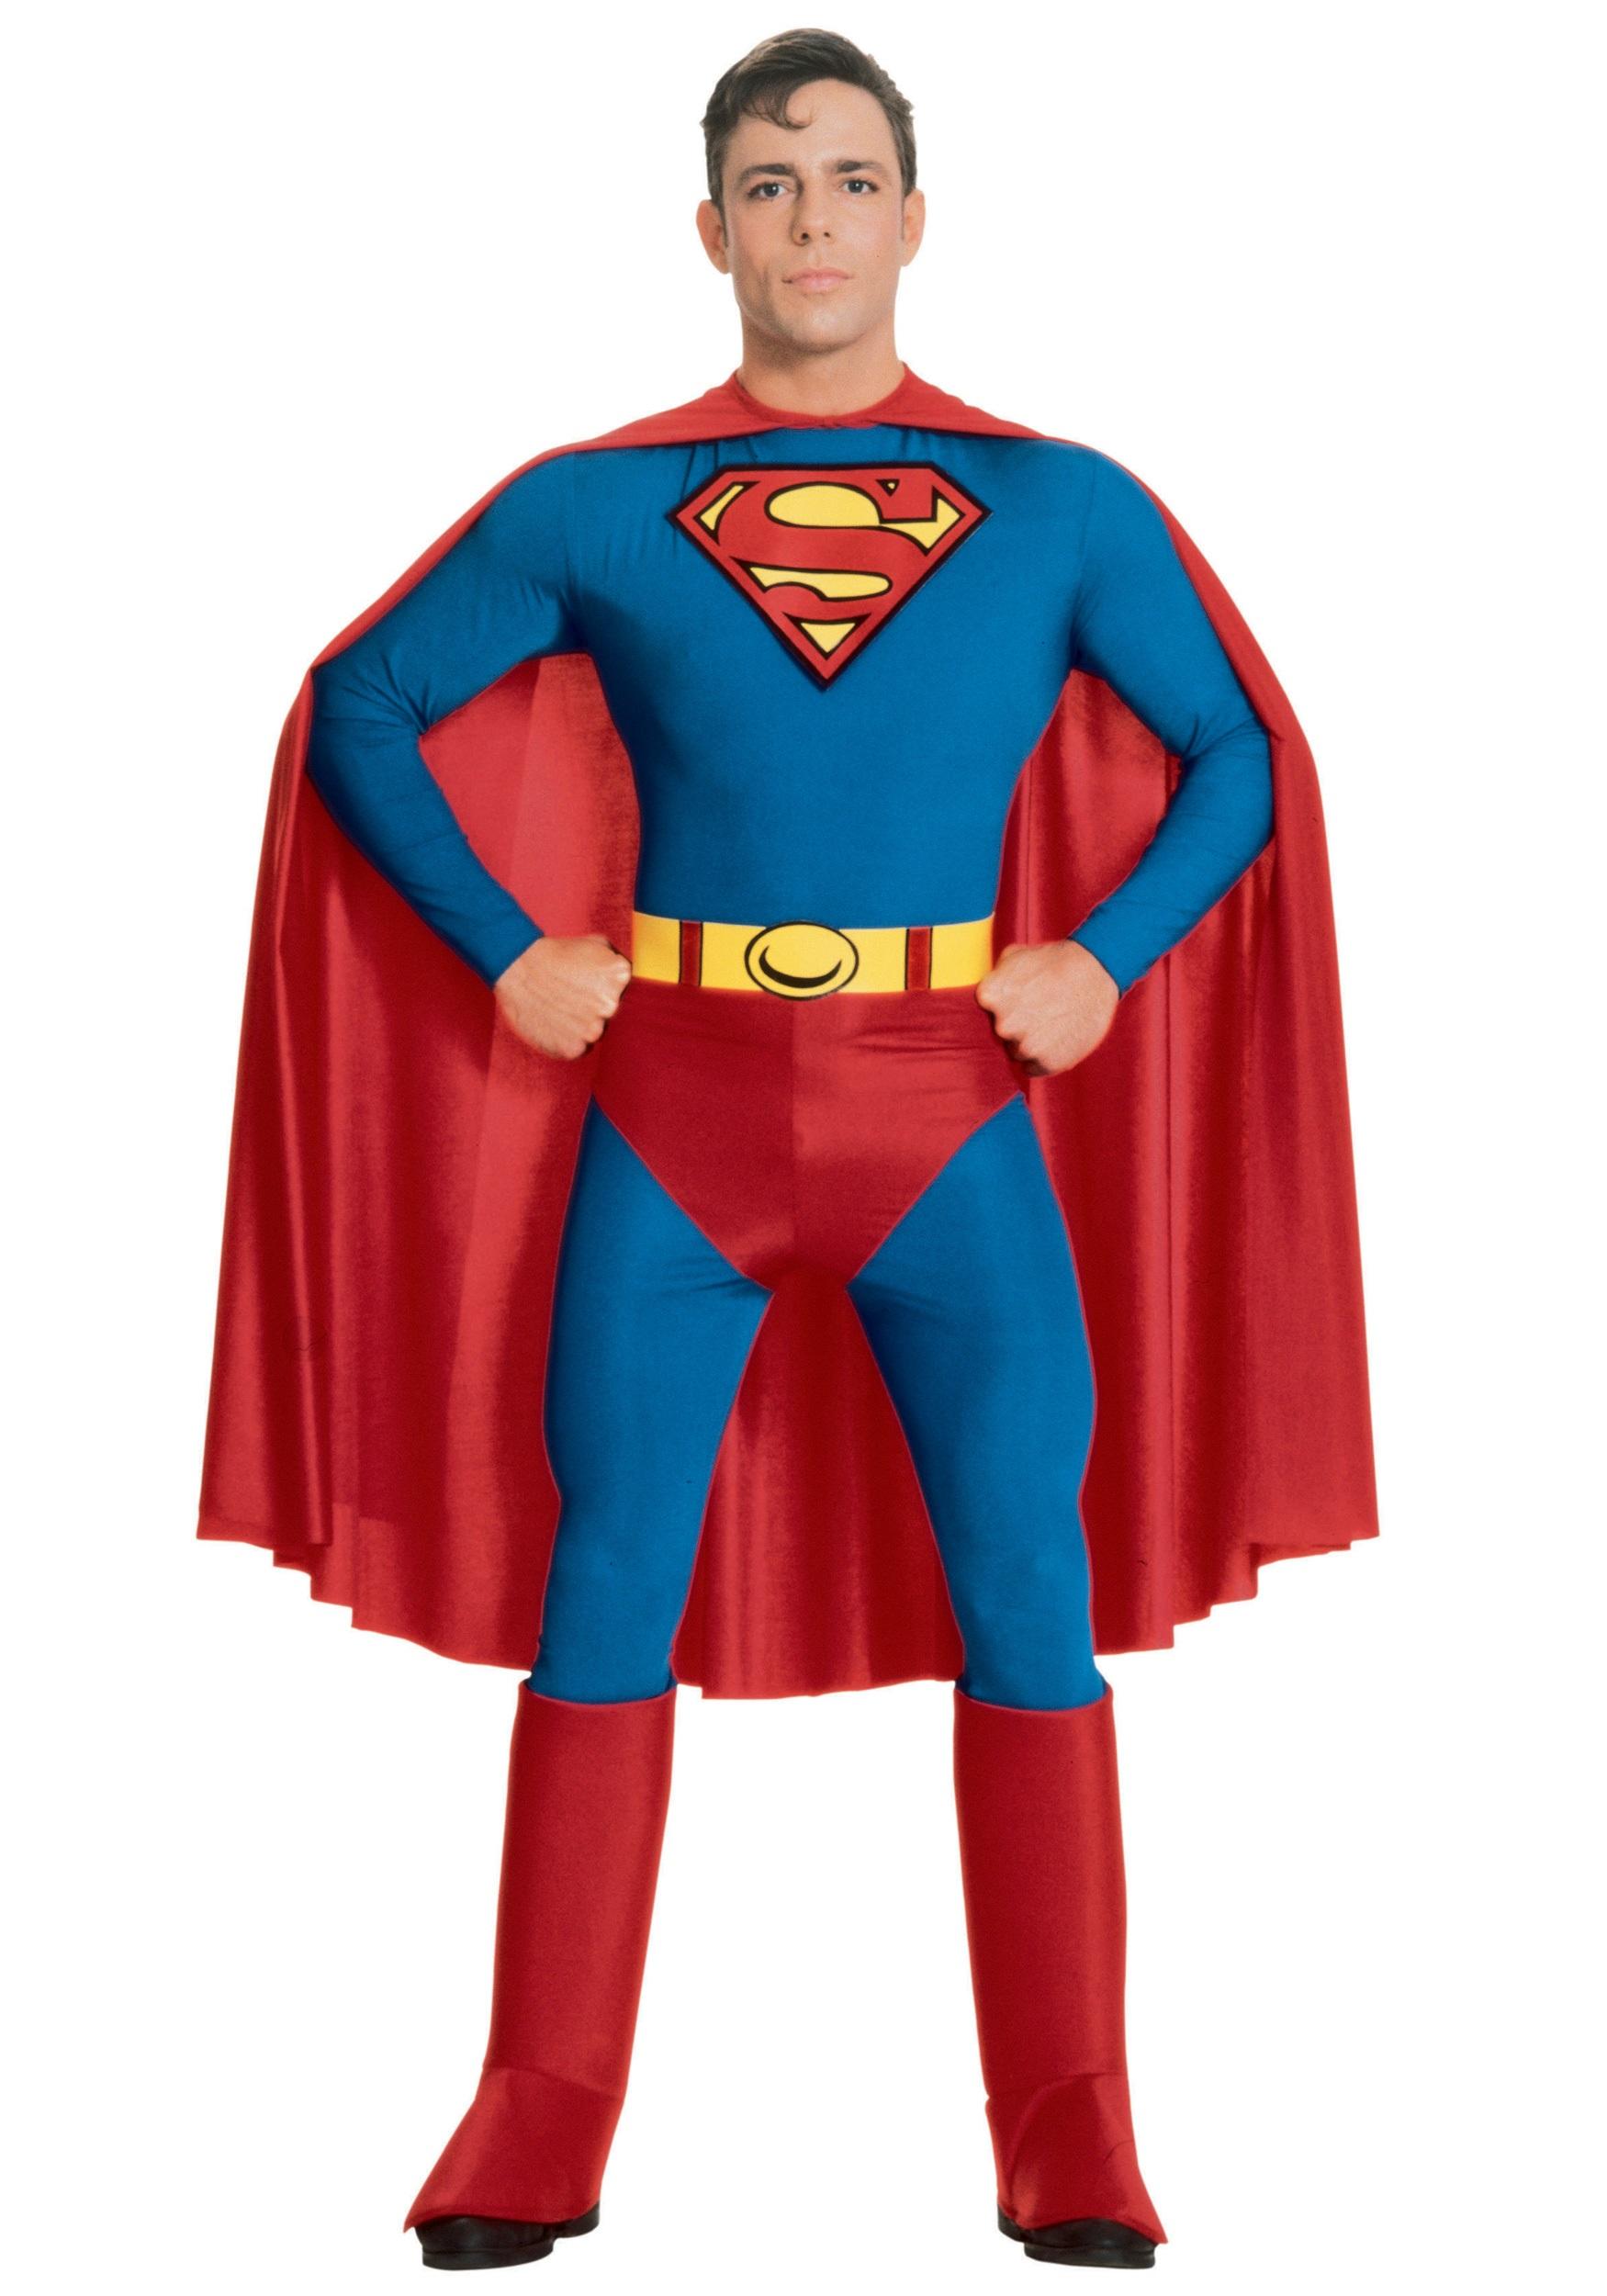 ... villain s; male superhero costumes men s superhero halloween costumes ...  sc 1 st  The Halloween - aaasne & Superhero Villain Halloween Costumes - The Halloween